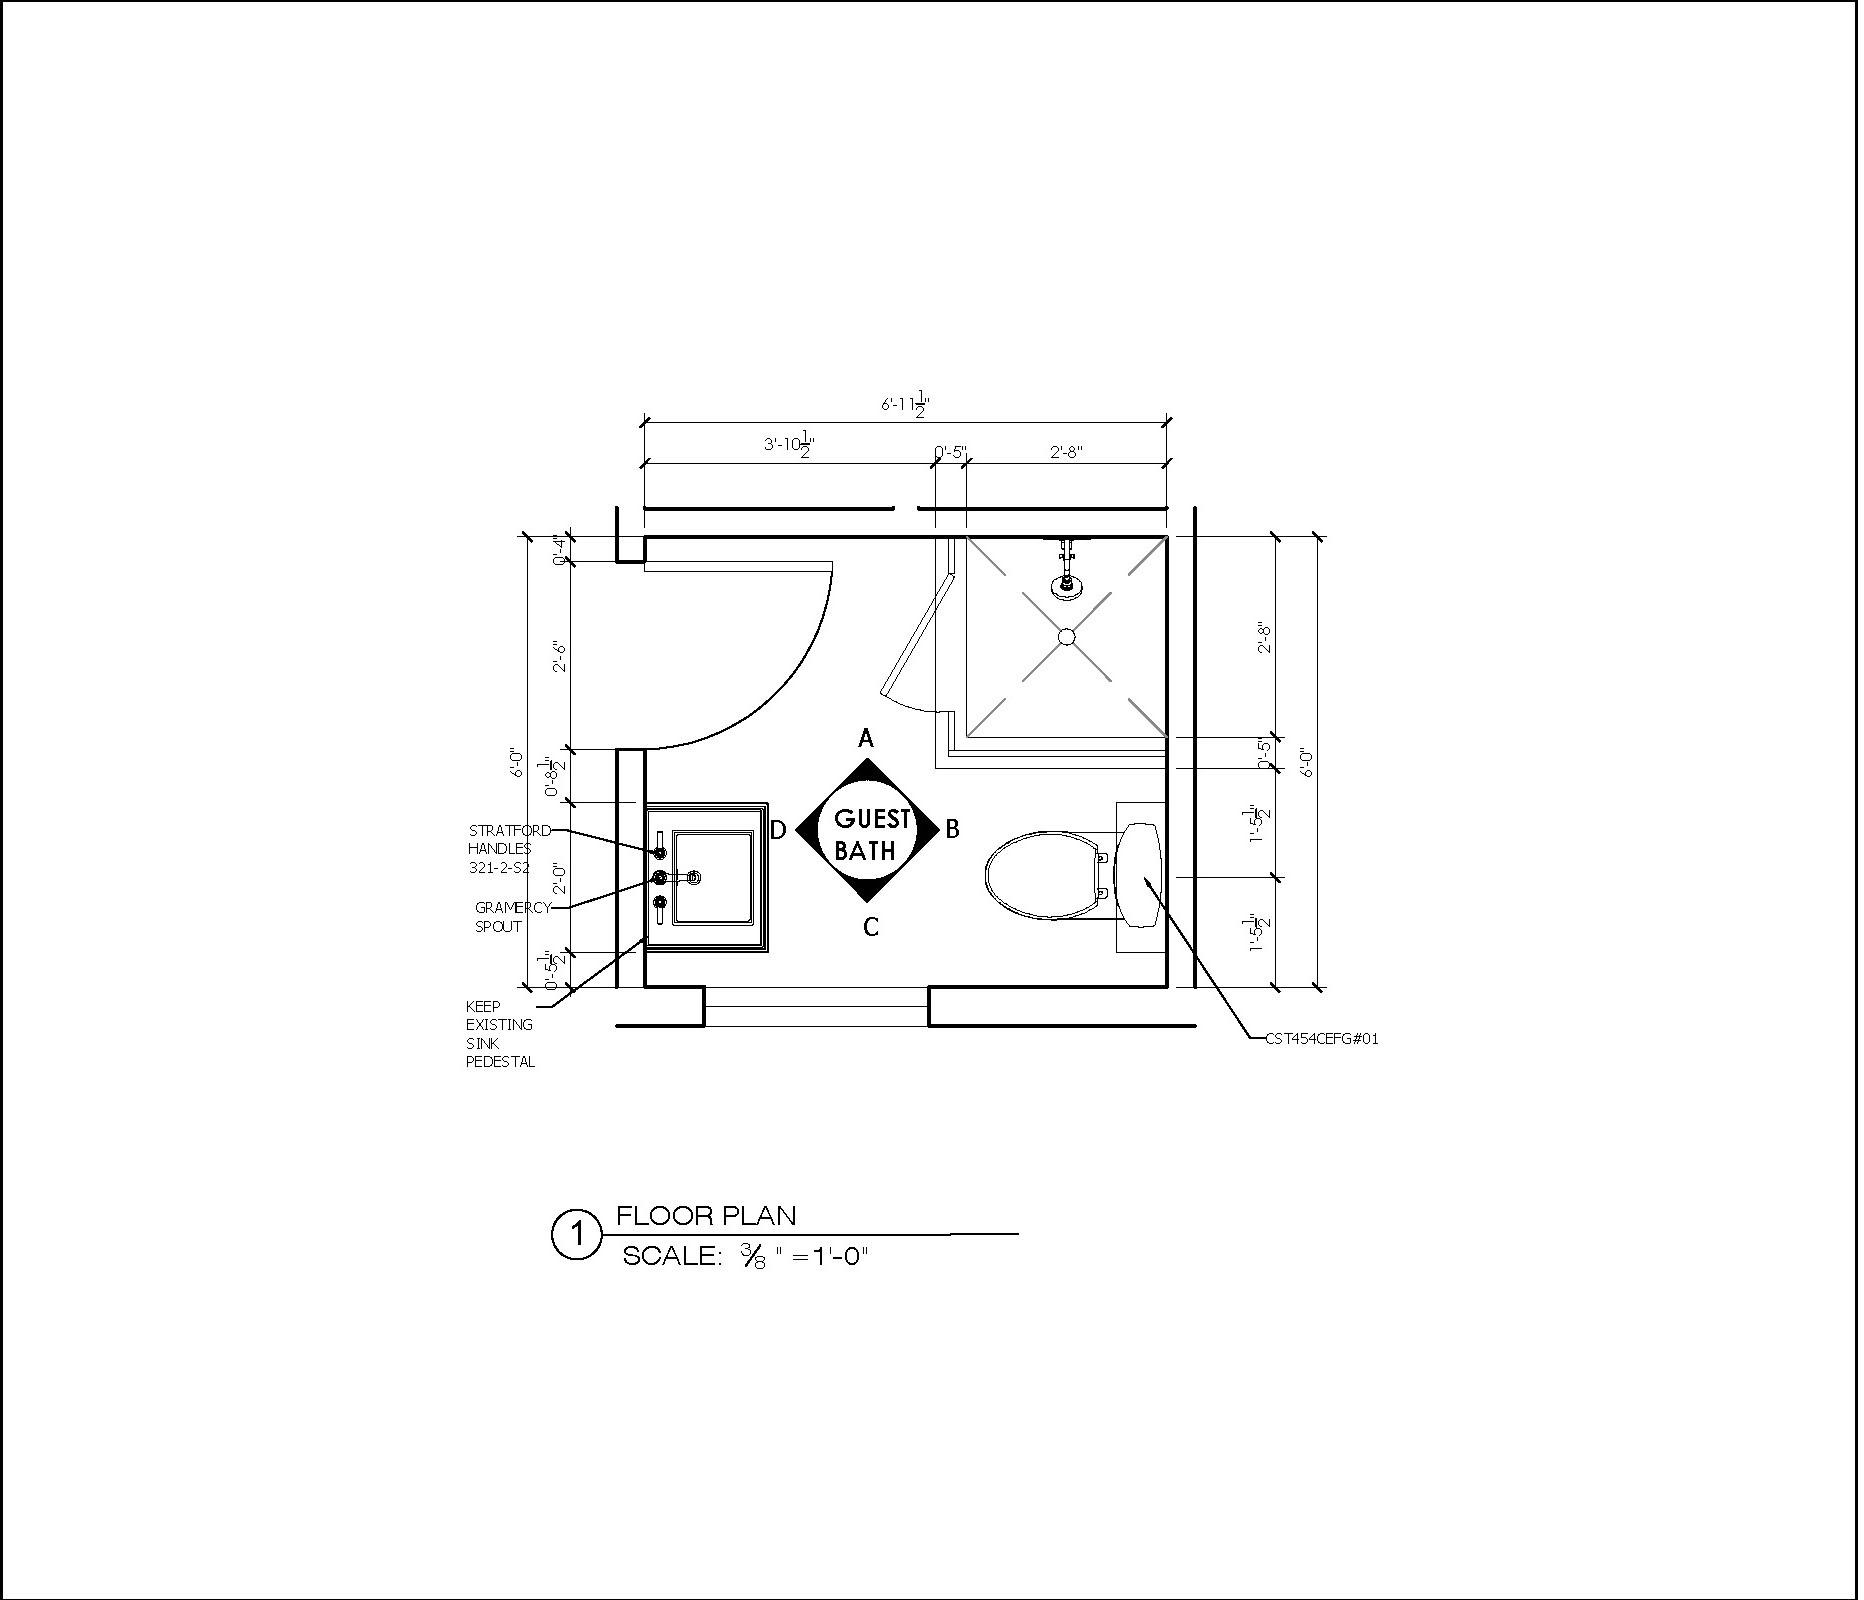 Megan Bachmann Interiors-Remodeling drawings